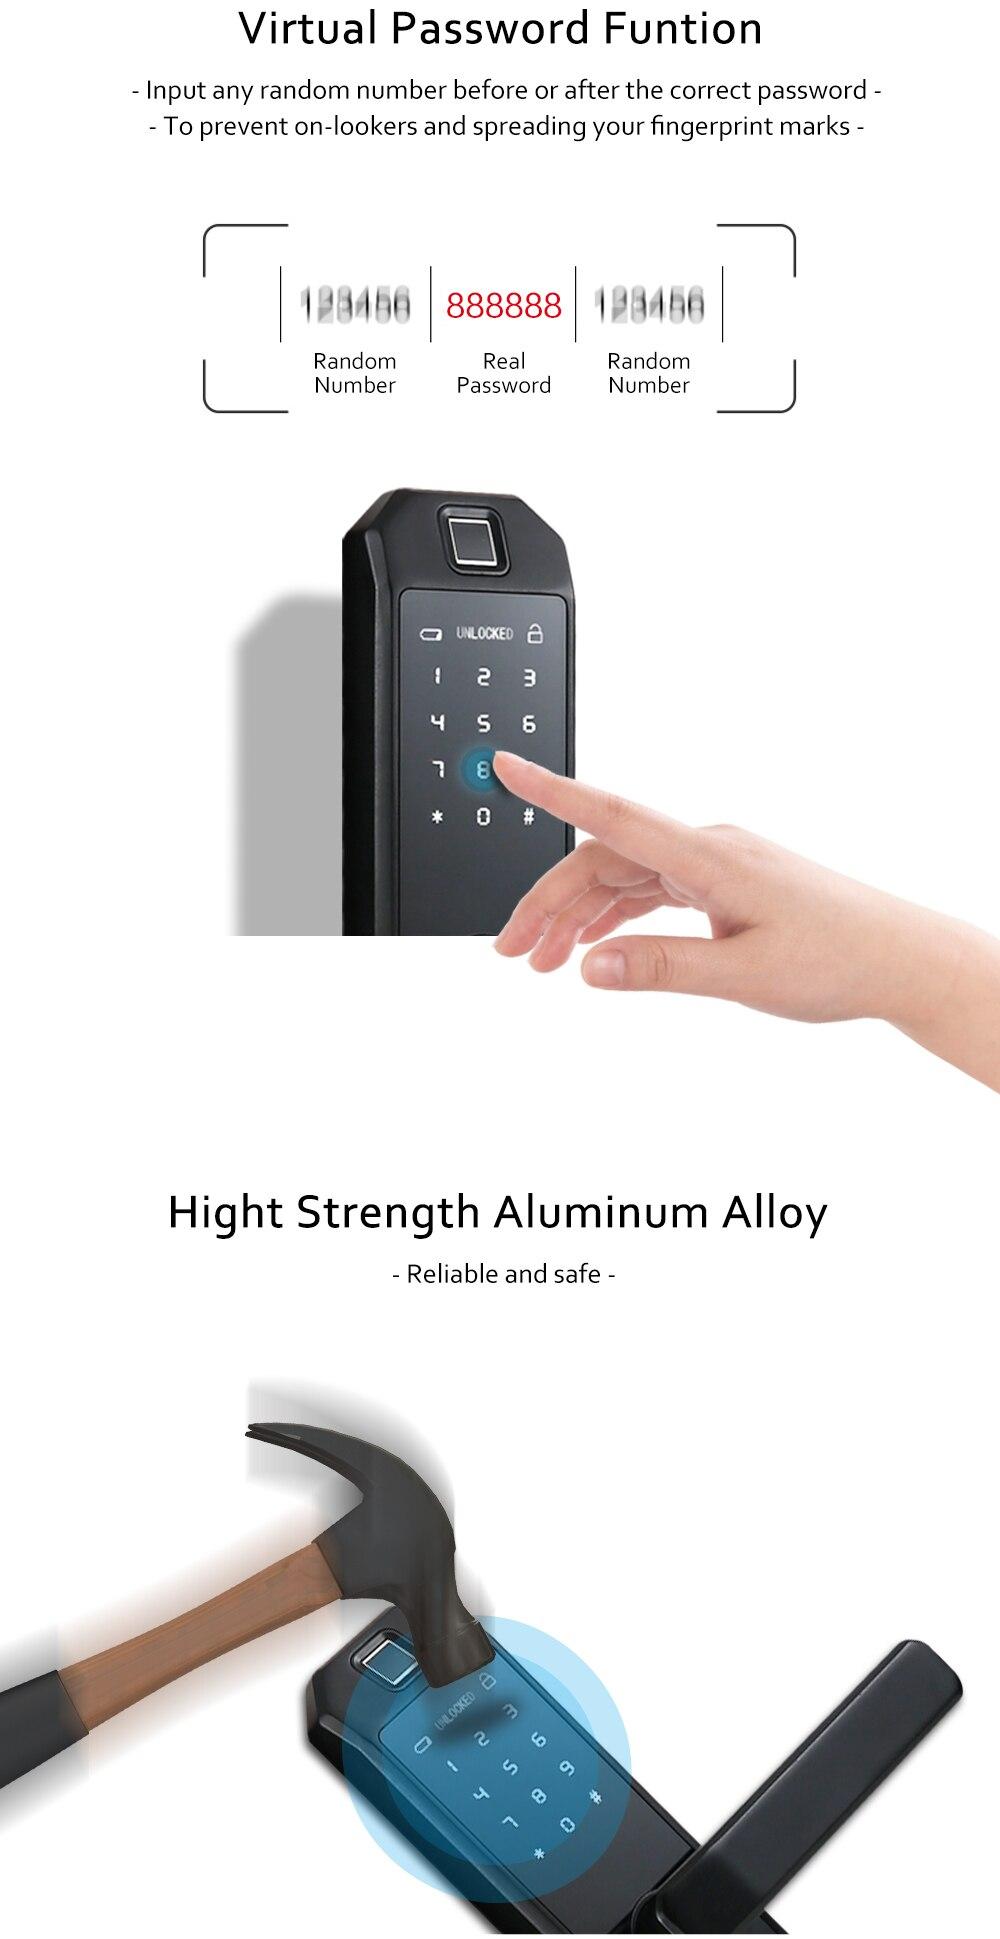 H745c6ec44d5b40afb793f971a6063f99V WIFI Smart Fingerprint Door Lock Code Card Key Touch Screen Digital Password Lock Electronic Door Lock with Tuya Smart APP